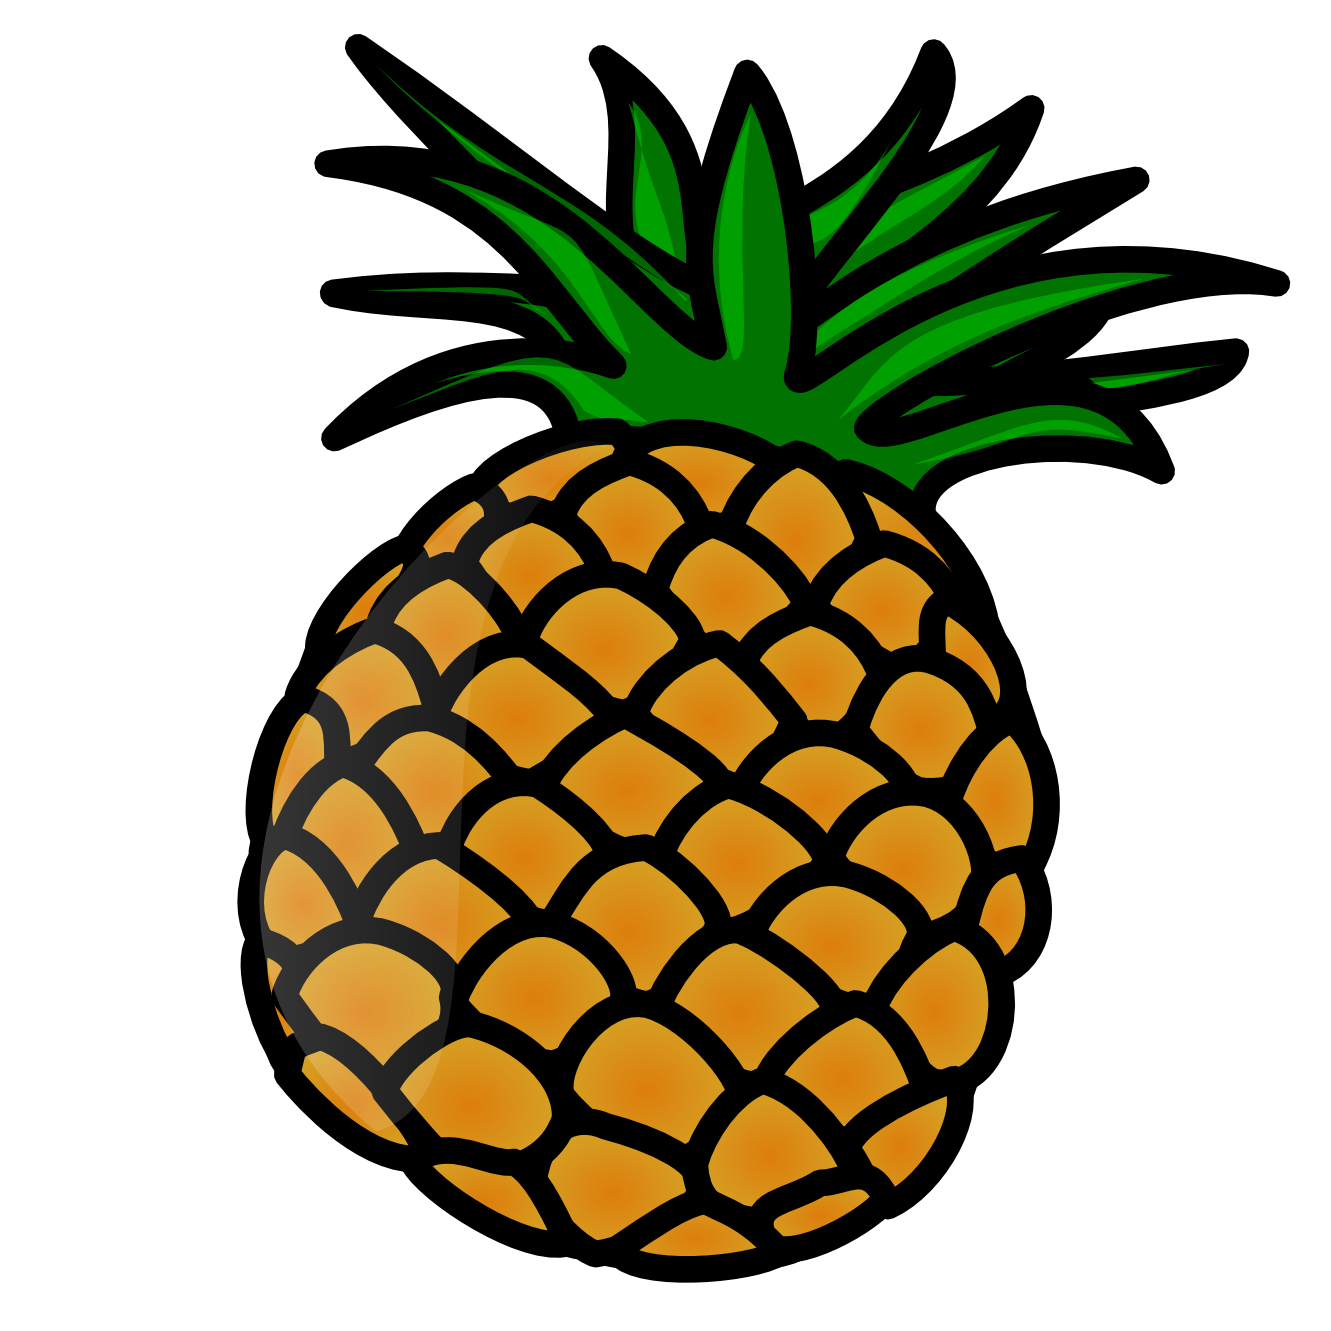 Pineapple clip art free clipart images 2 clipartwiz